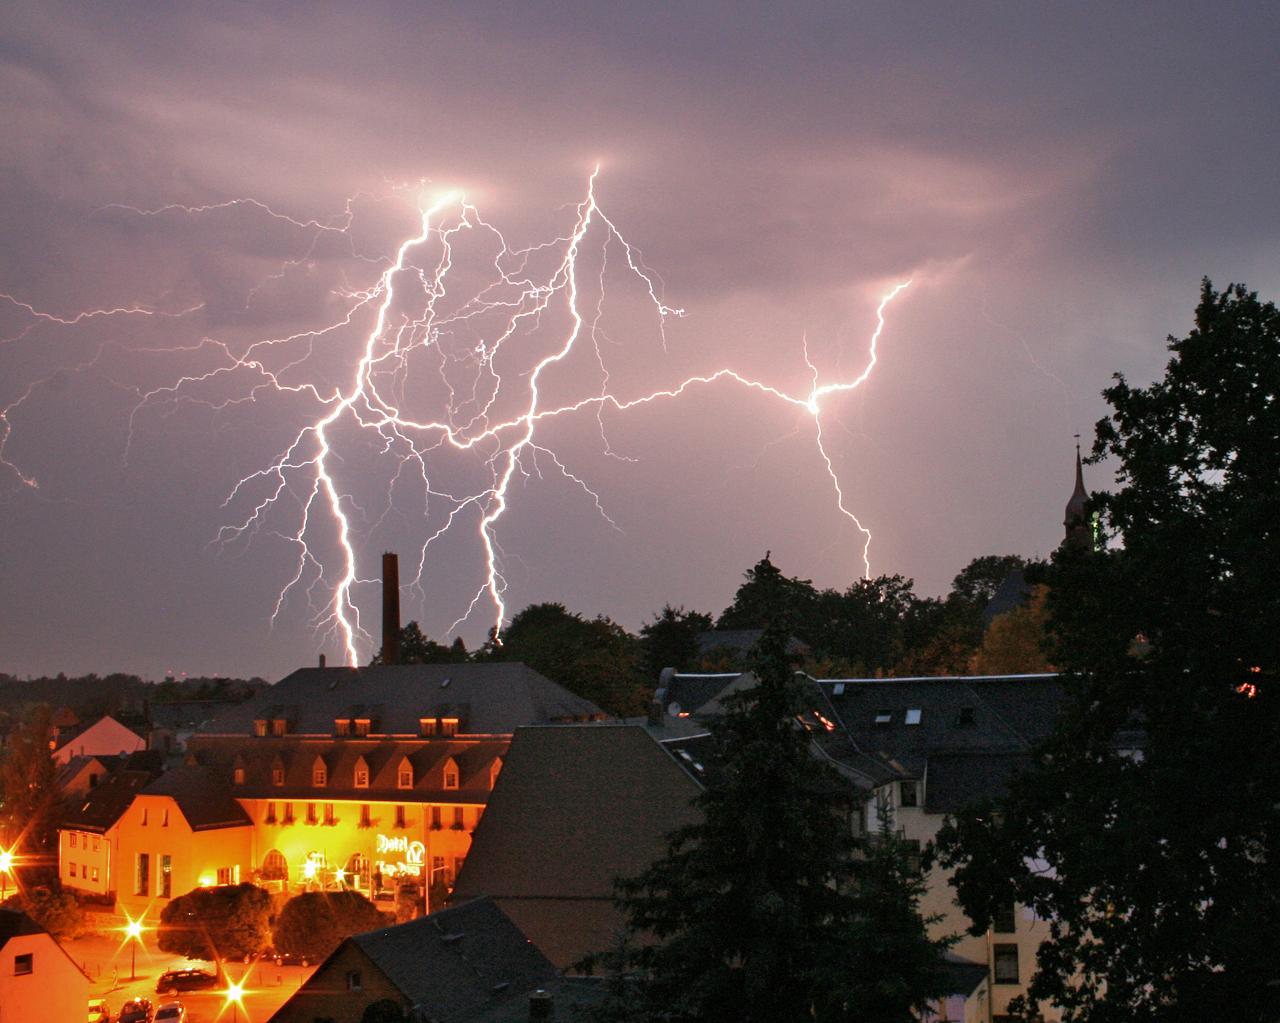 Gewitter in Limbach-Oberfrohna